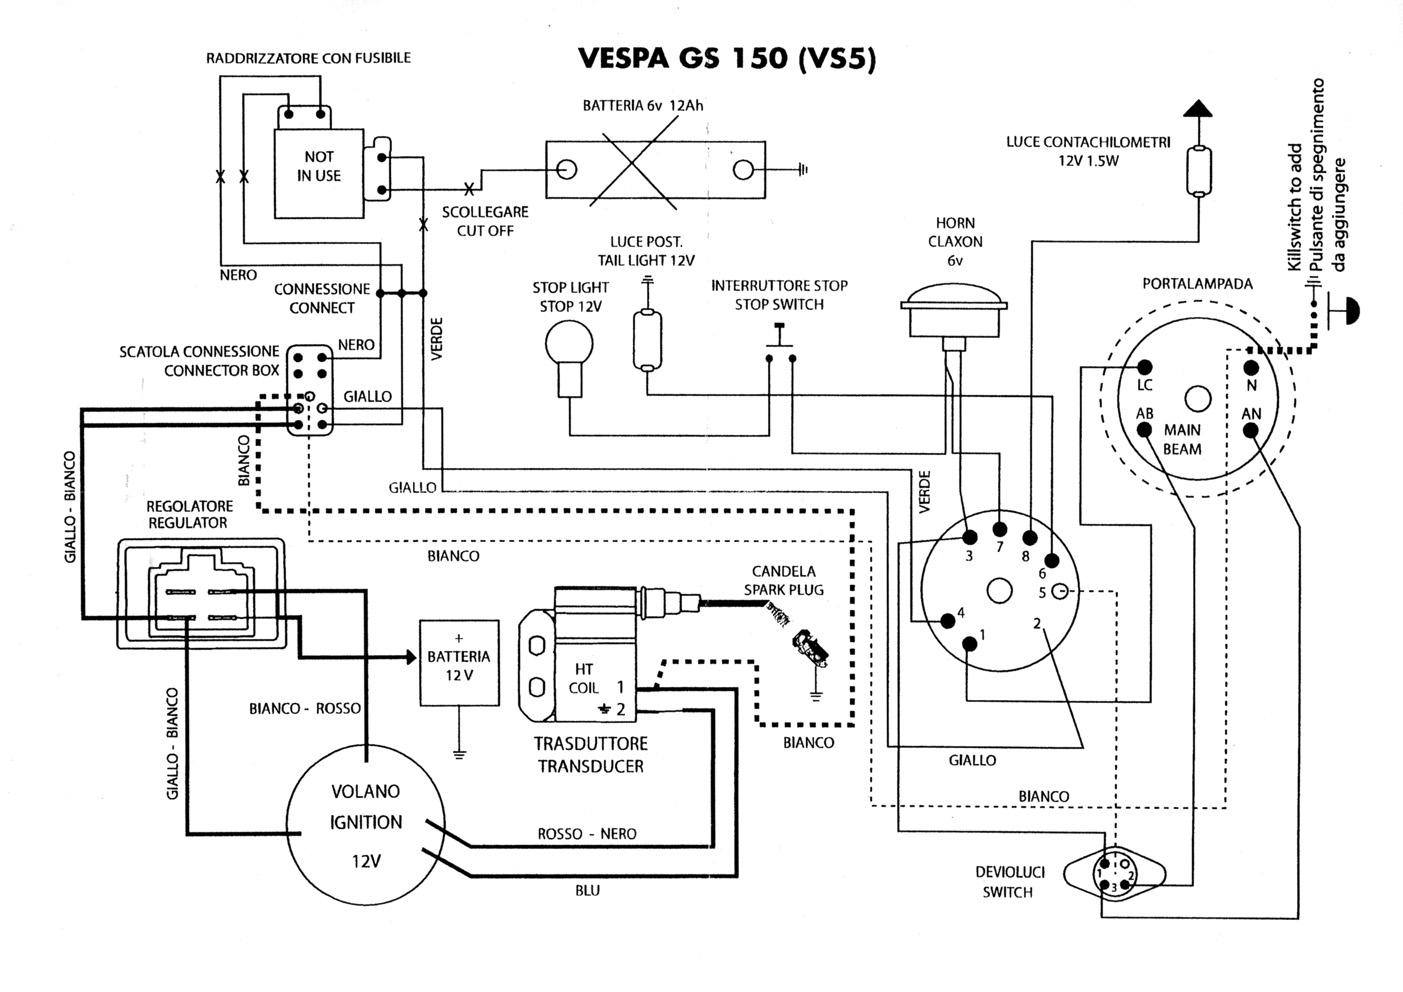 Ignition Evergreen Vespatronic Vespa Gs150 Gs3